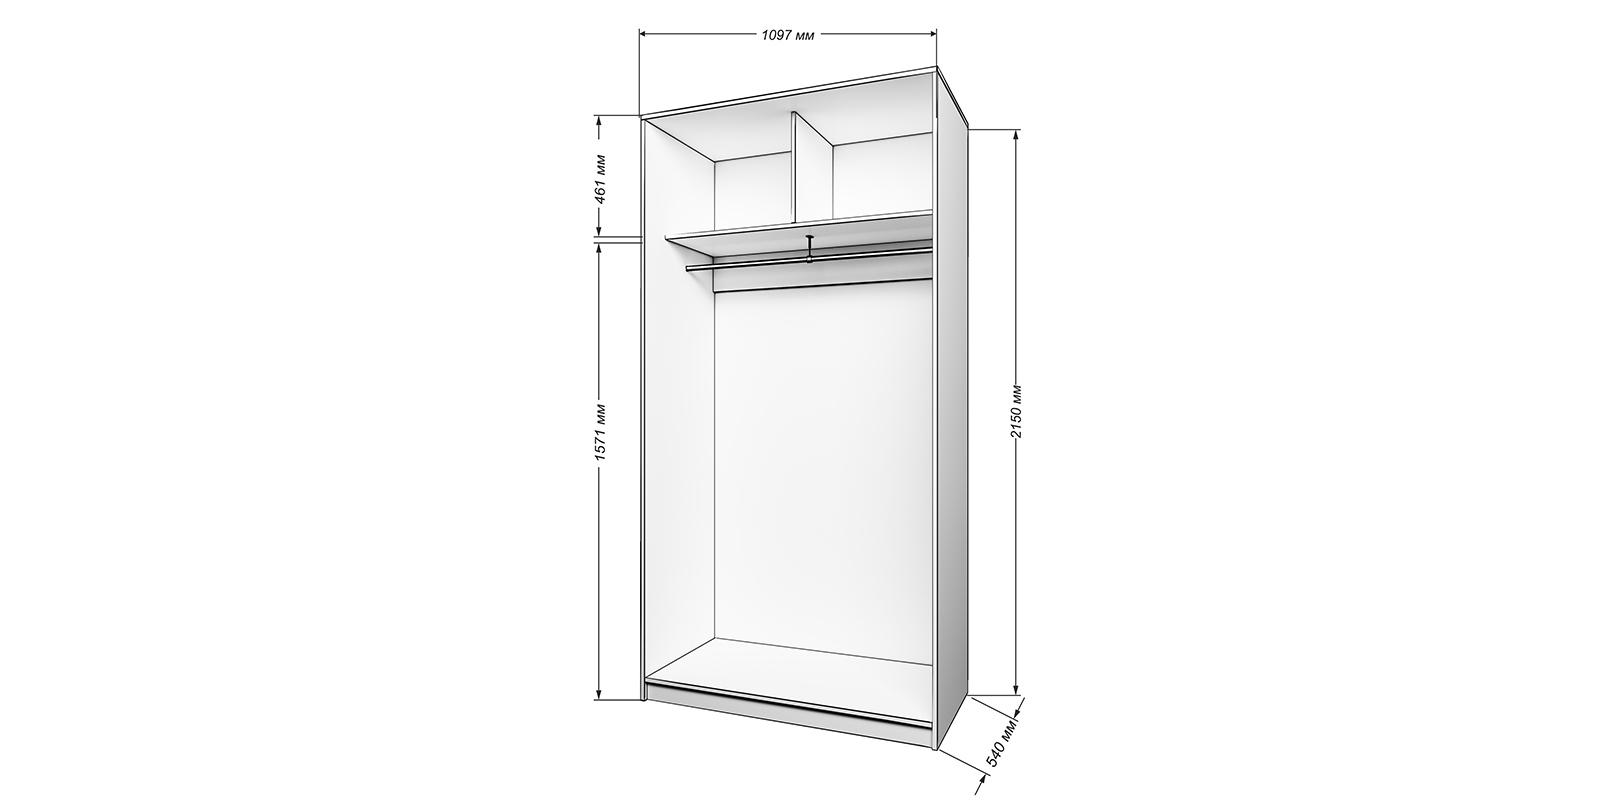 Шкаф-купе двухдверный Бостон 110 см вариант №1 (белый+зеркало)